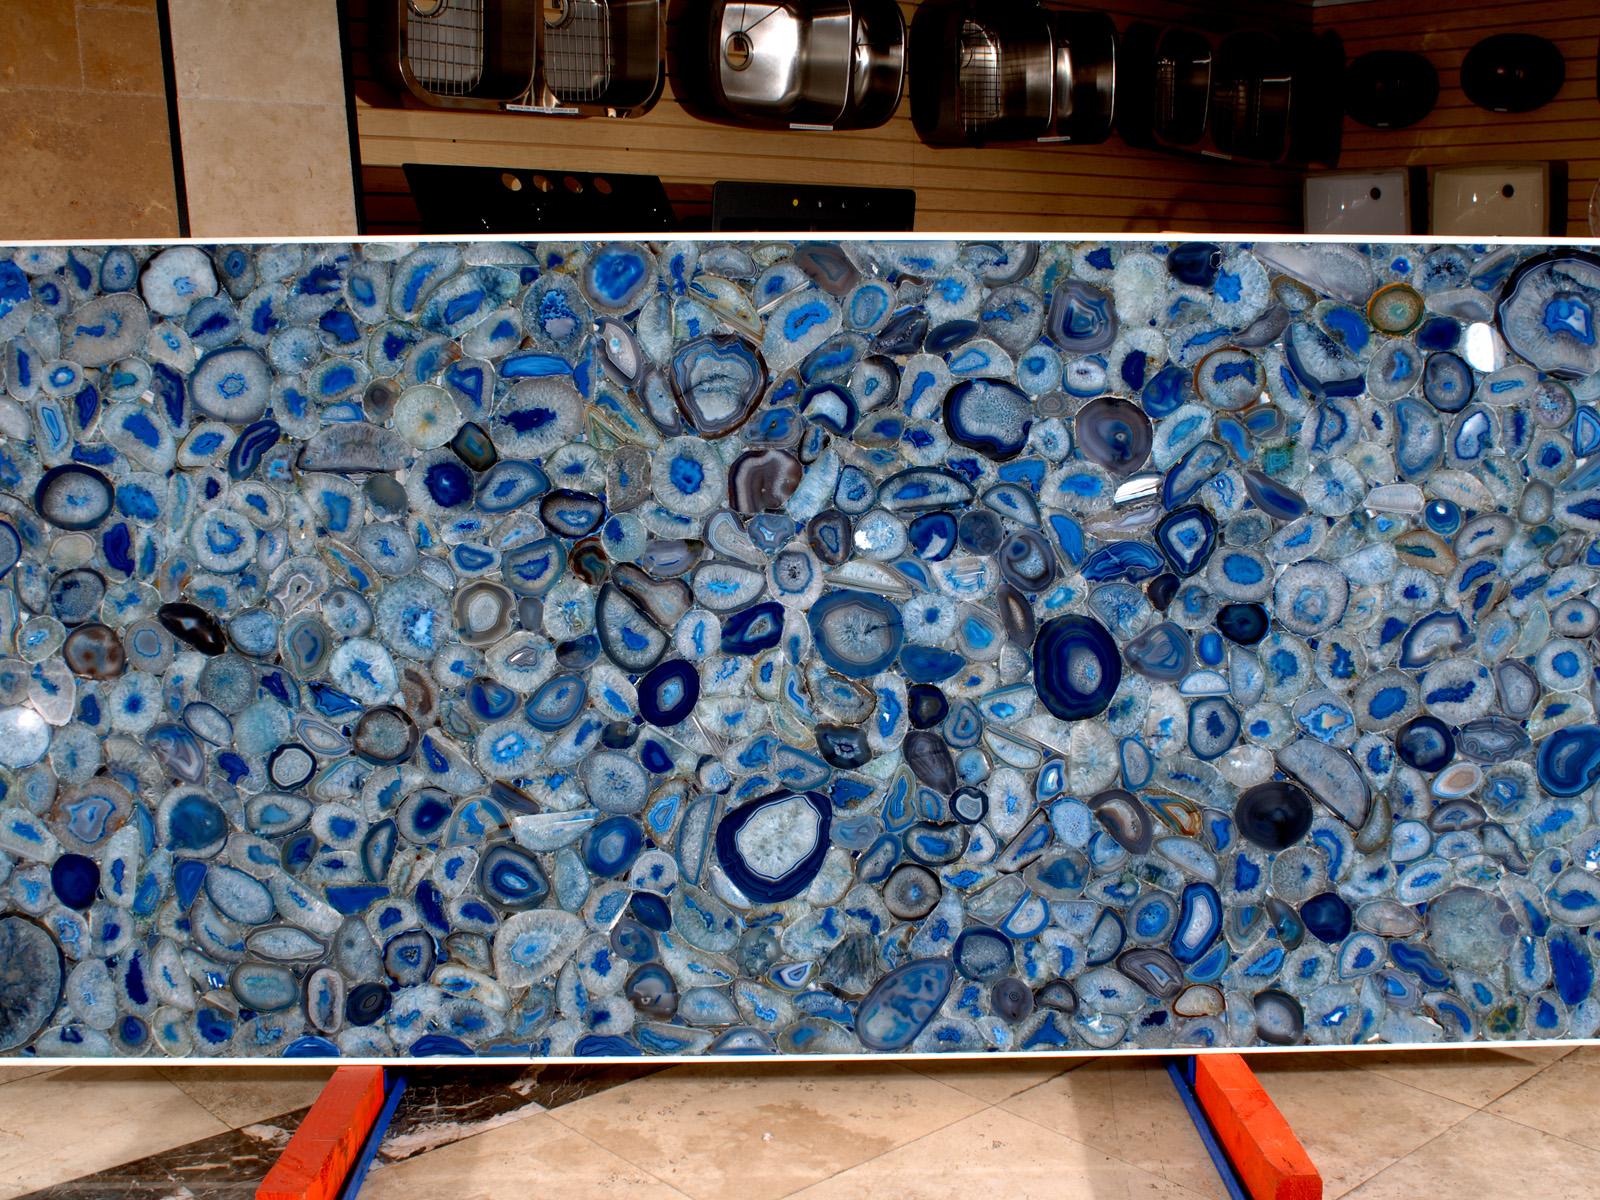 Blue Agate - 8531 - Omicron Granite & Tile